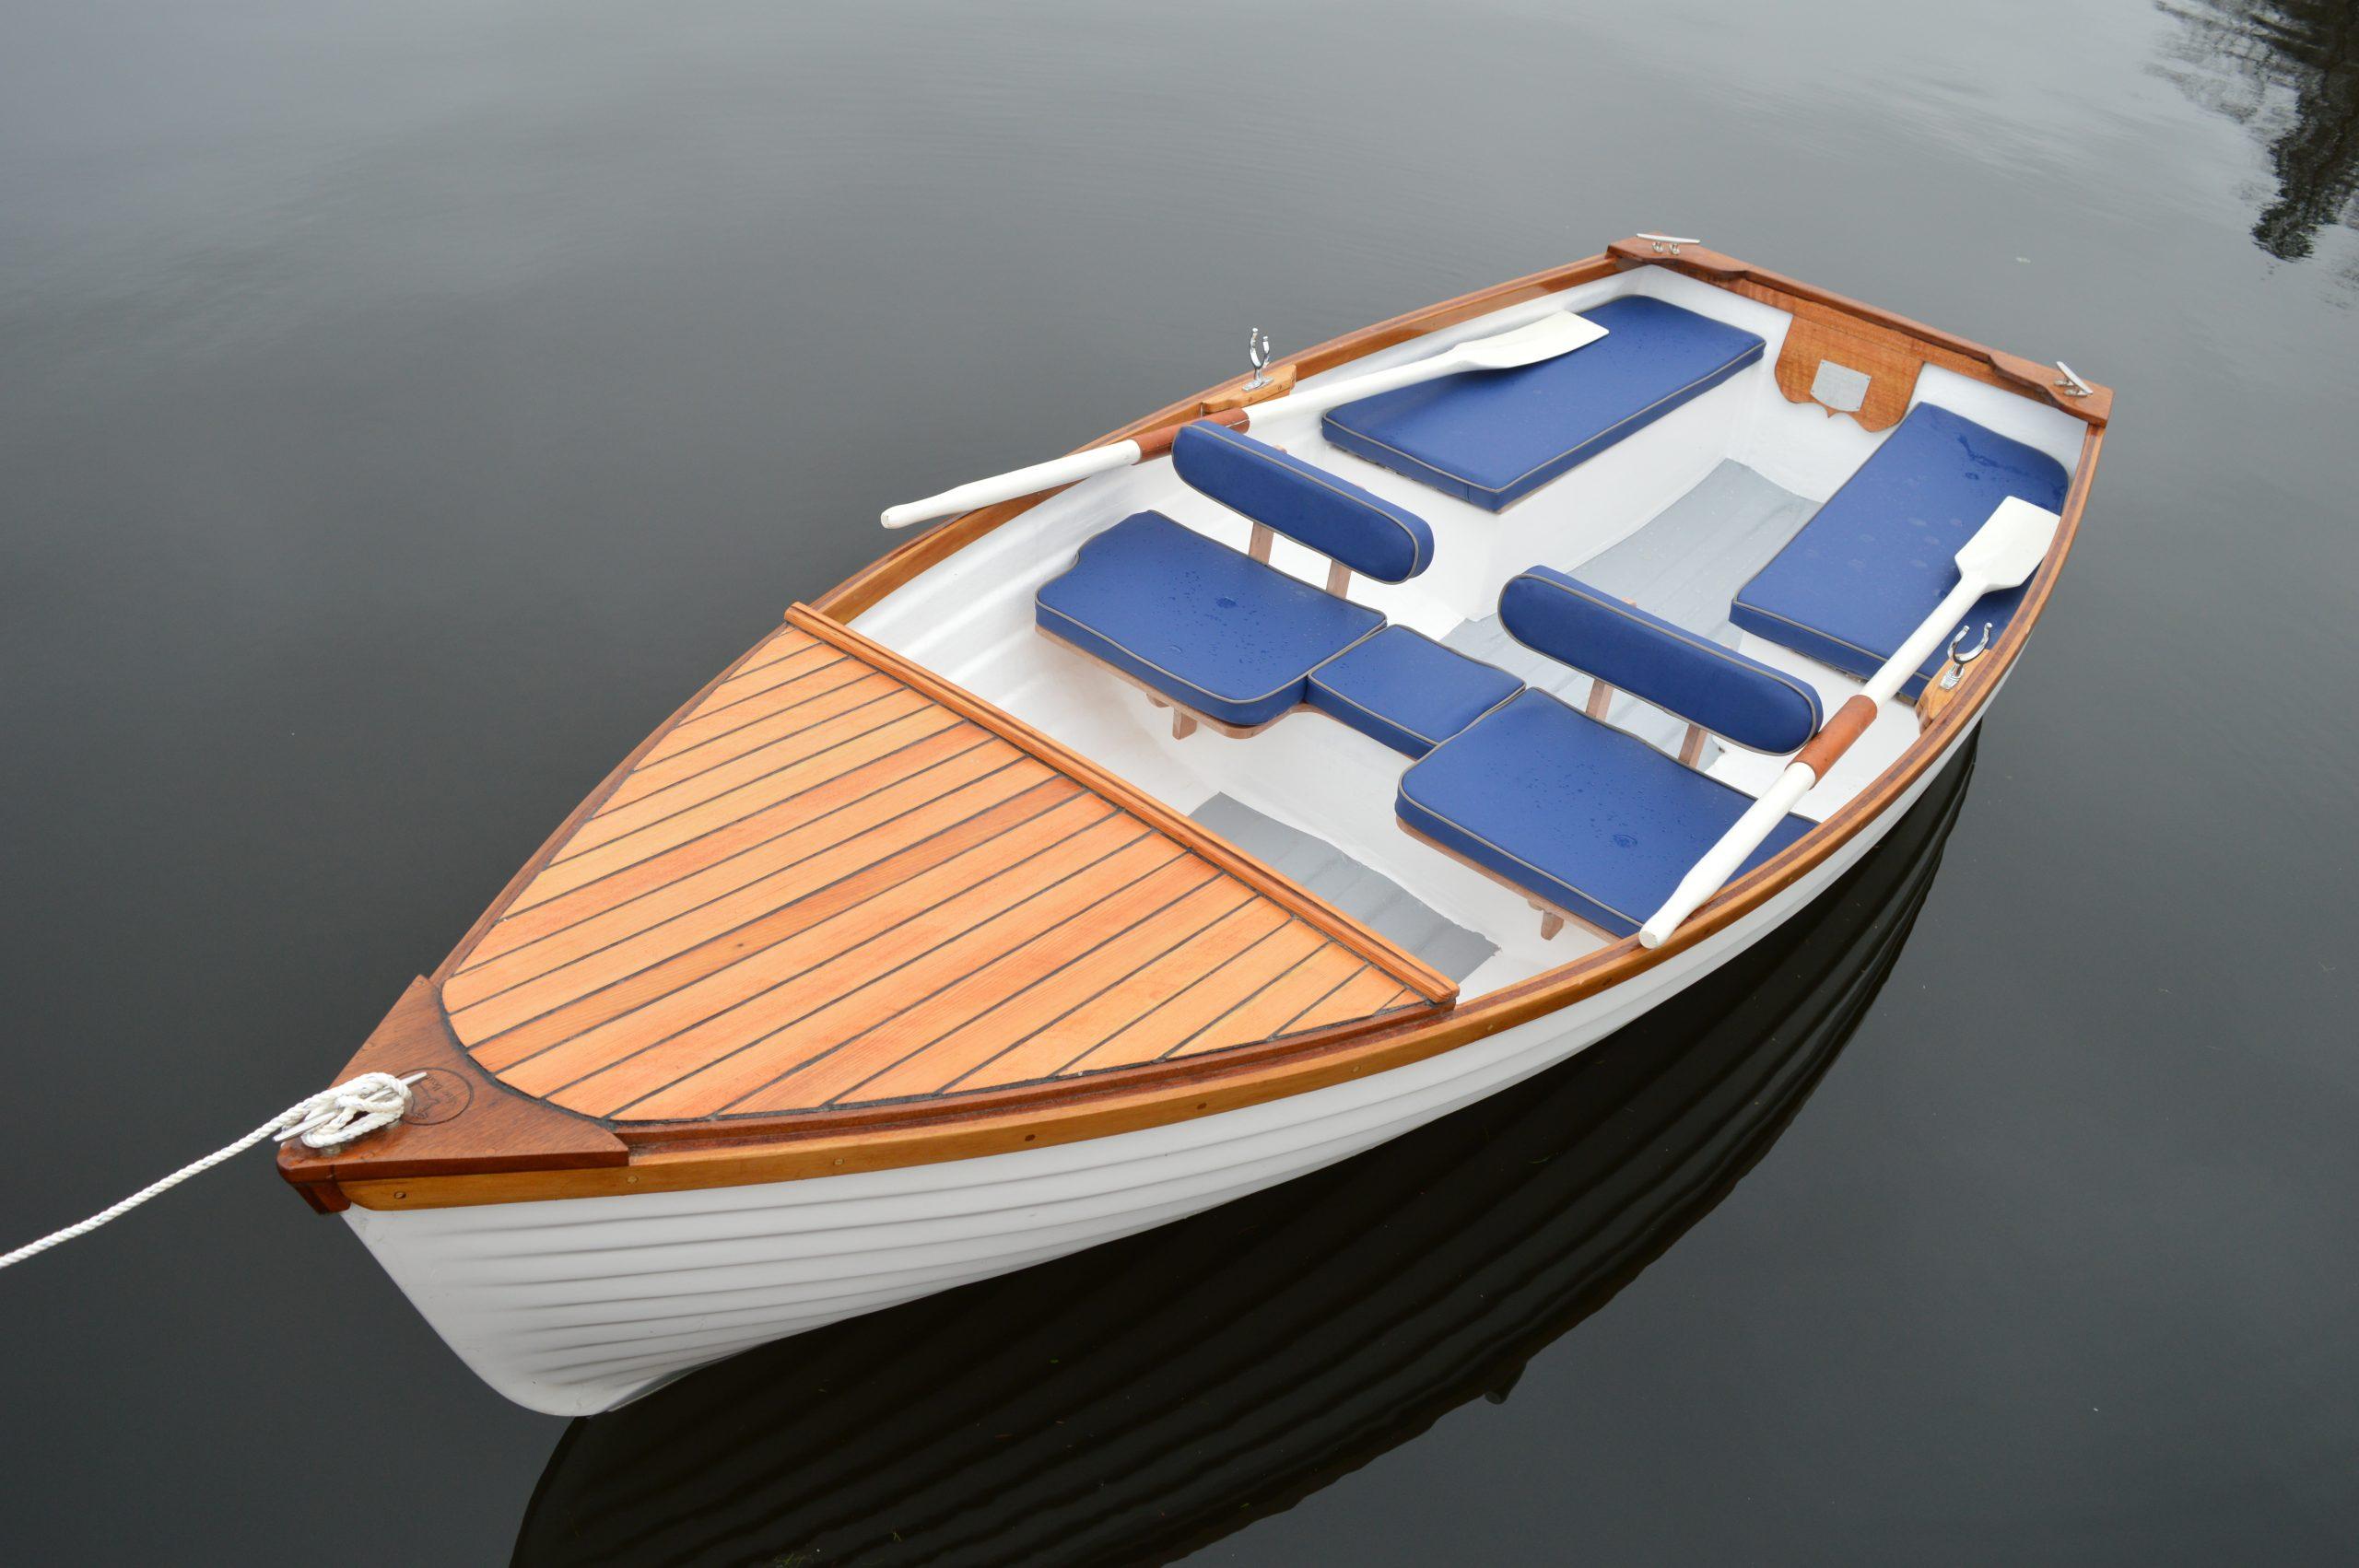 Skur 12ft Tolv Boat Tender/Dinghy